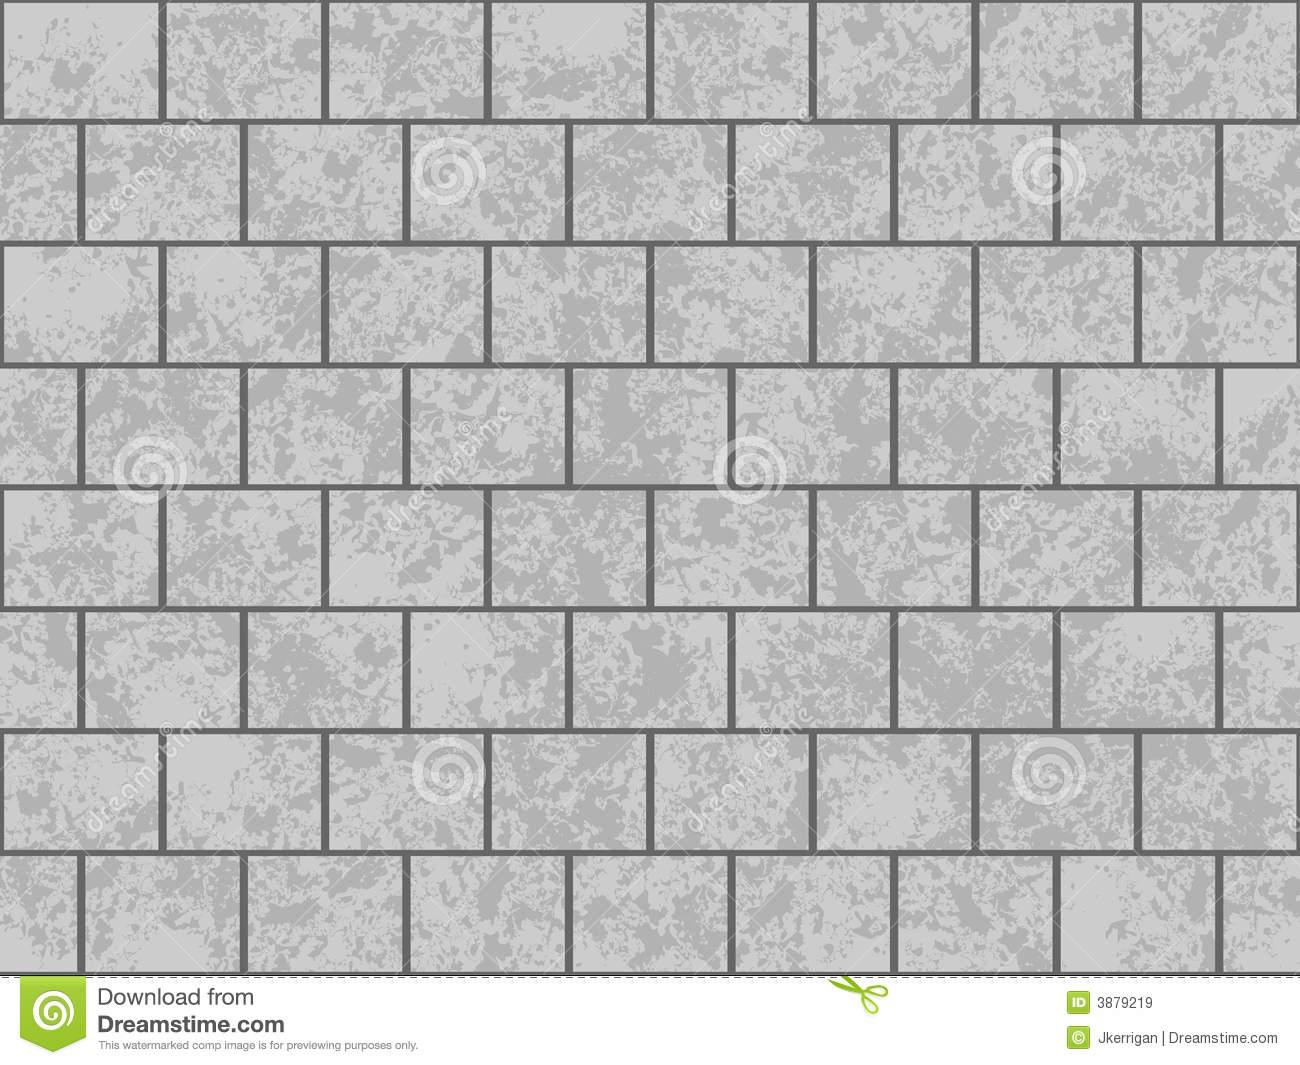 Block wall clipart download Block wall clipart - ClipartFest download